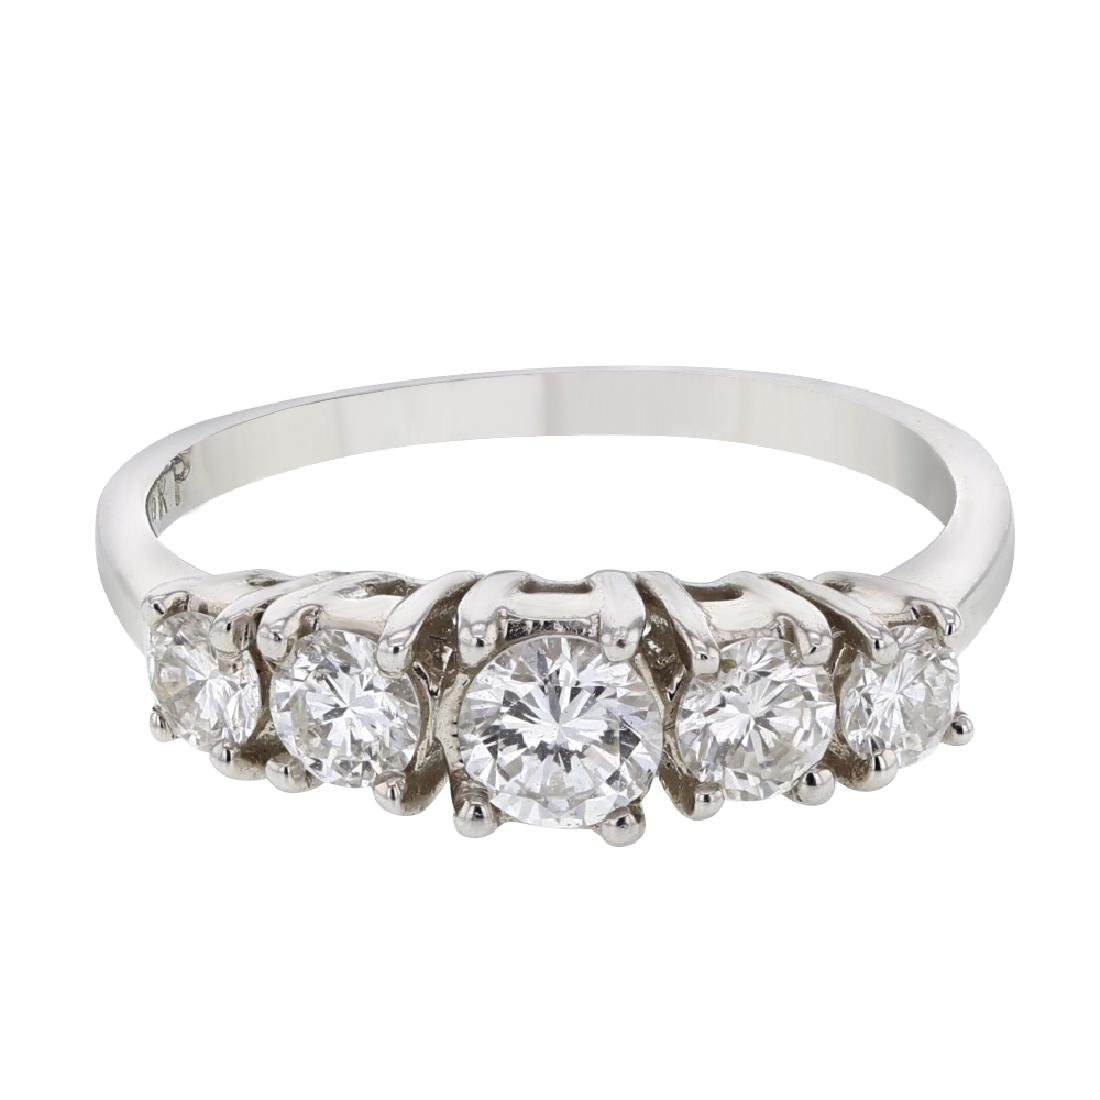 0.67 CTW Diamond Fashion  Ring in 18K White Gold